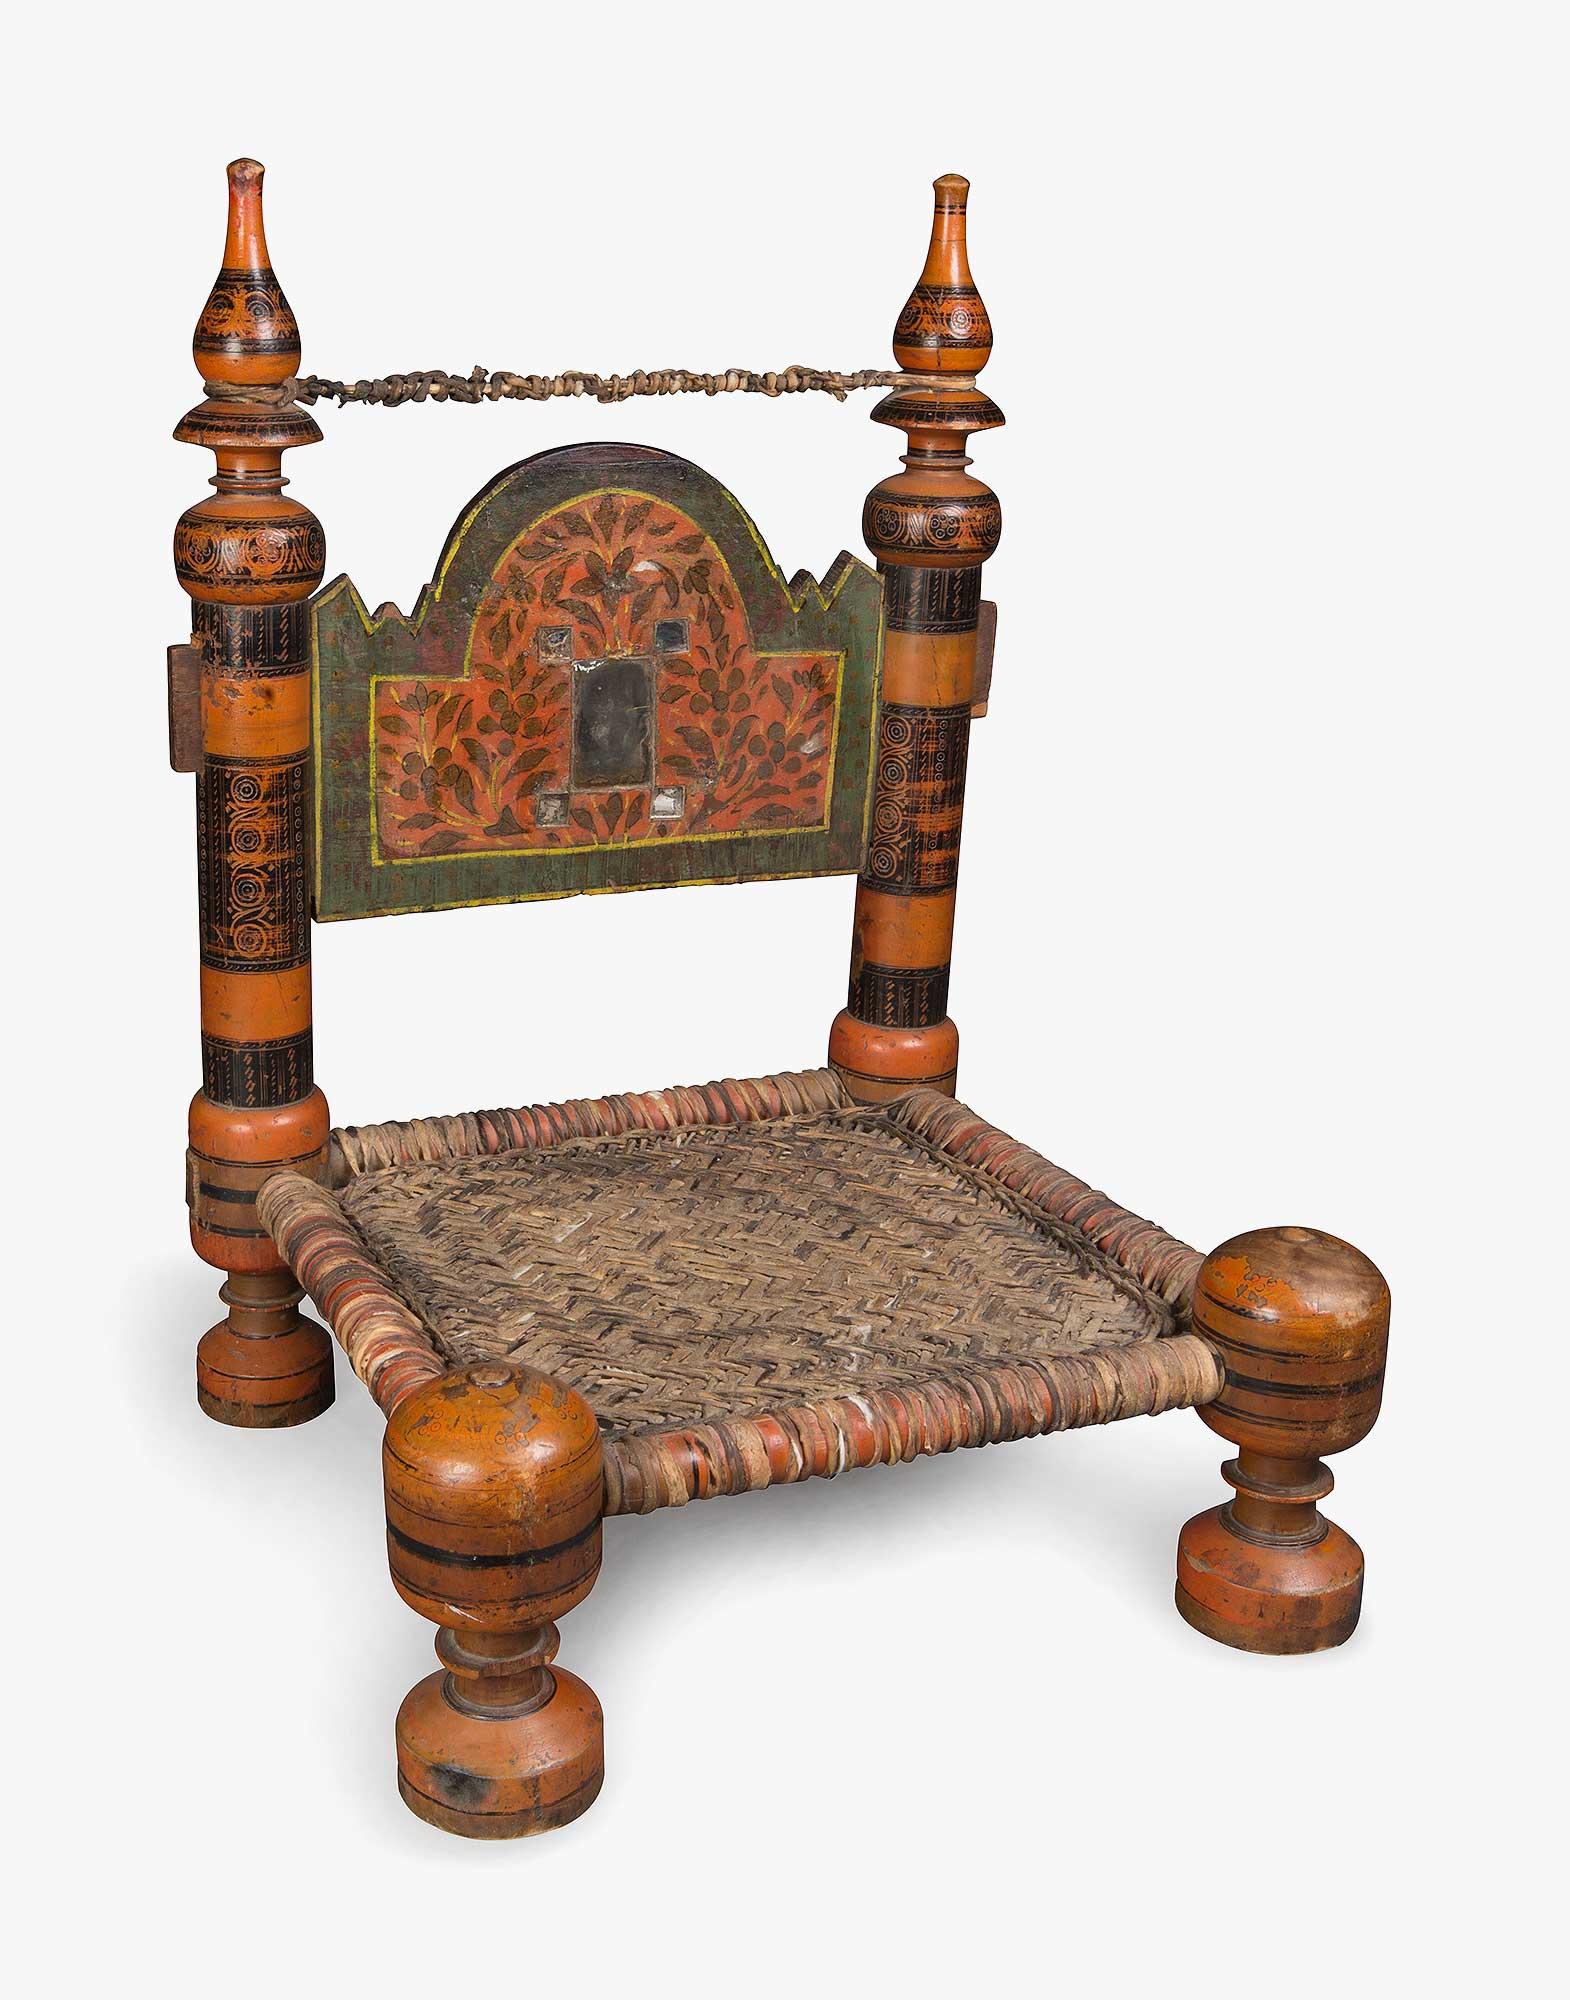 Uzbek Painted Wooden Wicker Chair